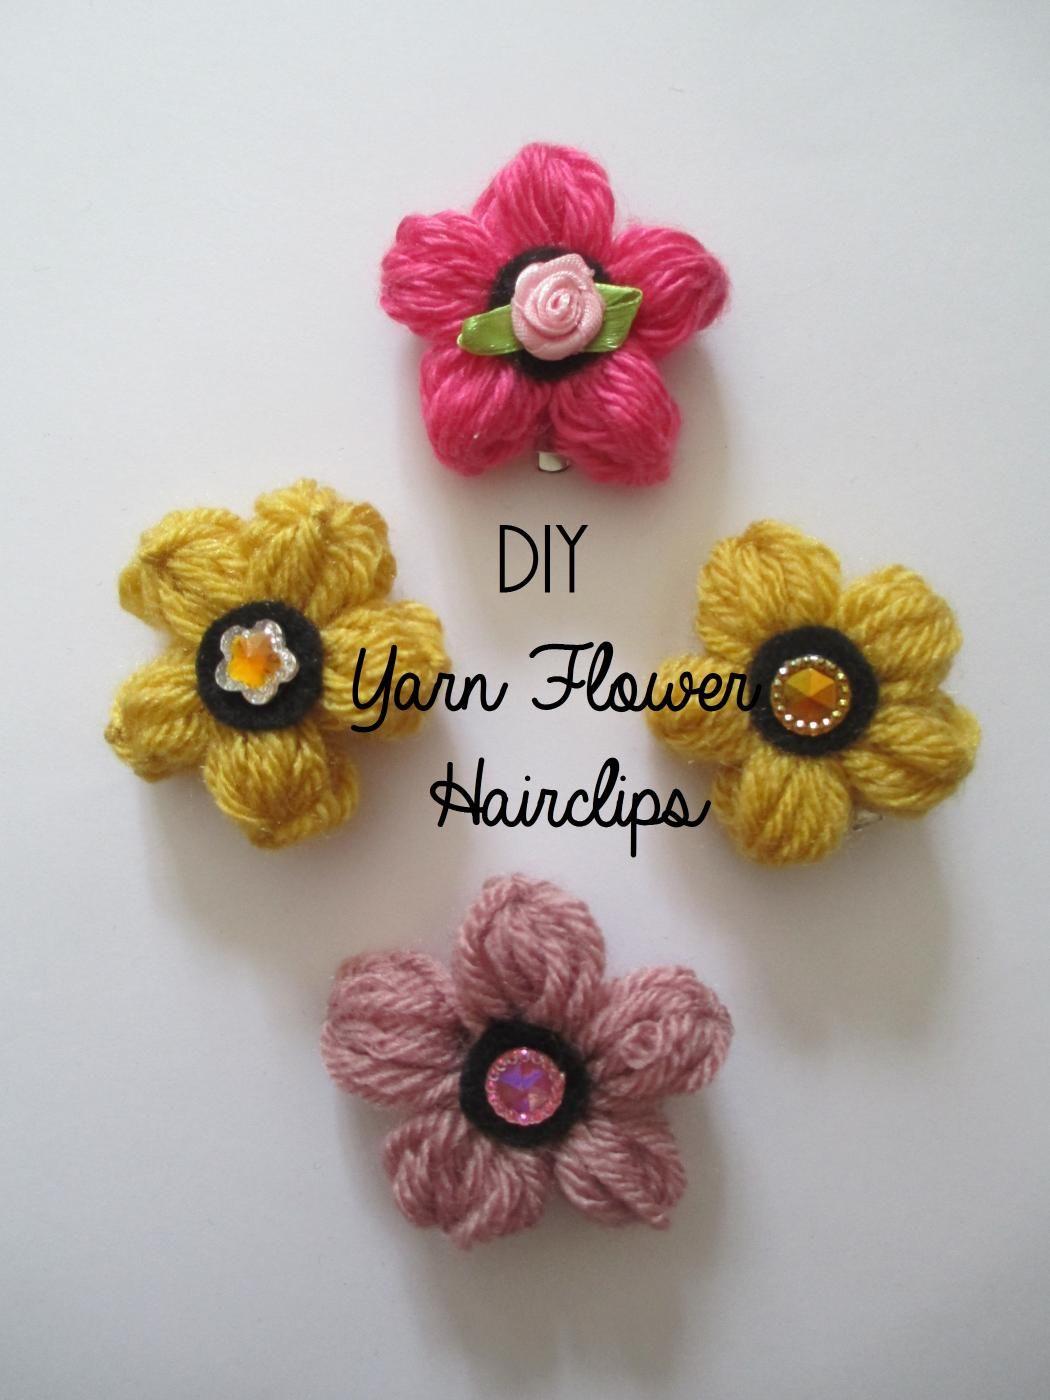 Diy Tutorial Diy Hair Diy Yarn Flower Hairclips